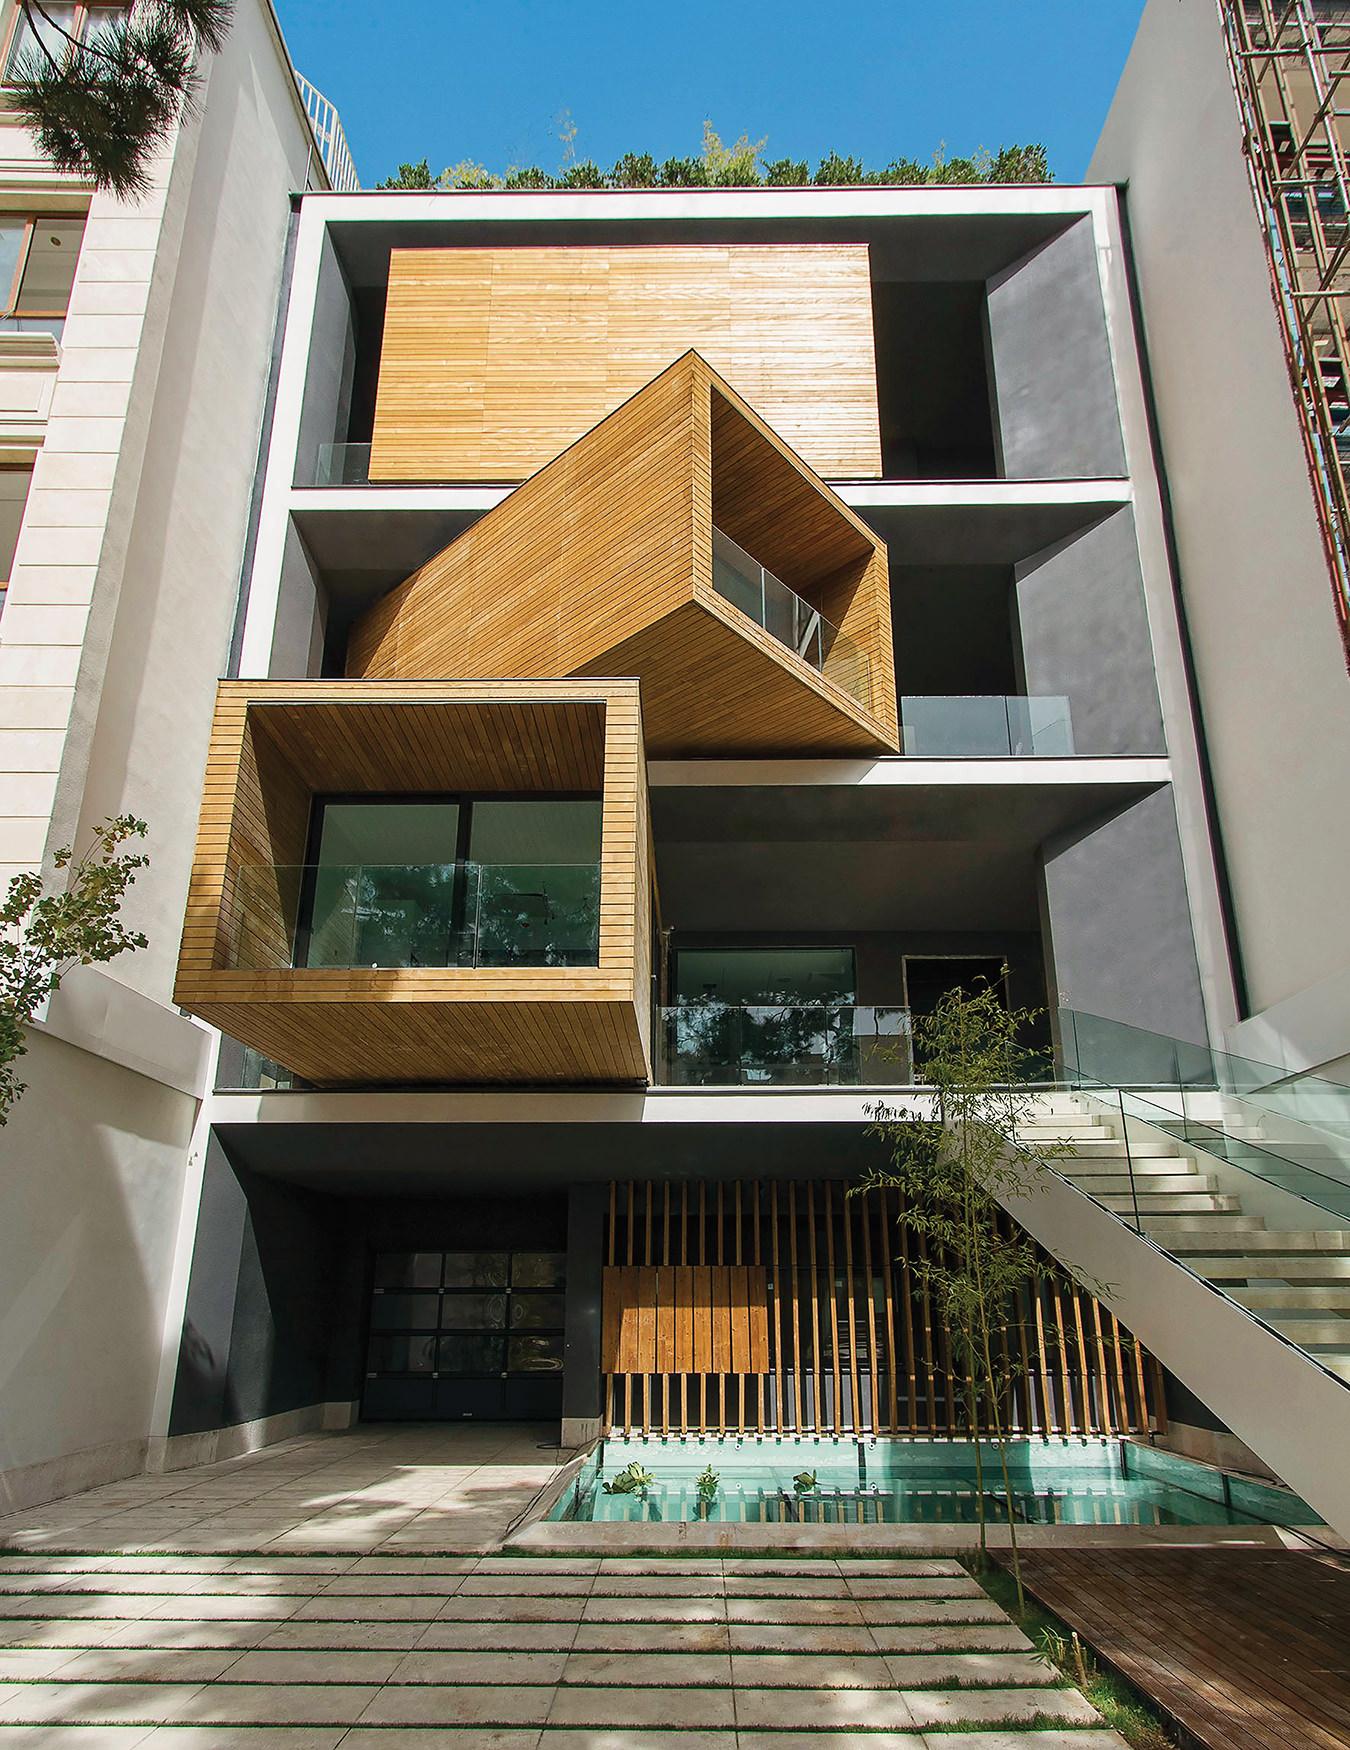 NUVO Spring 2015: The Sharifi-ha residence in Tehran